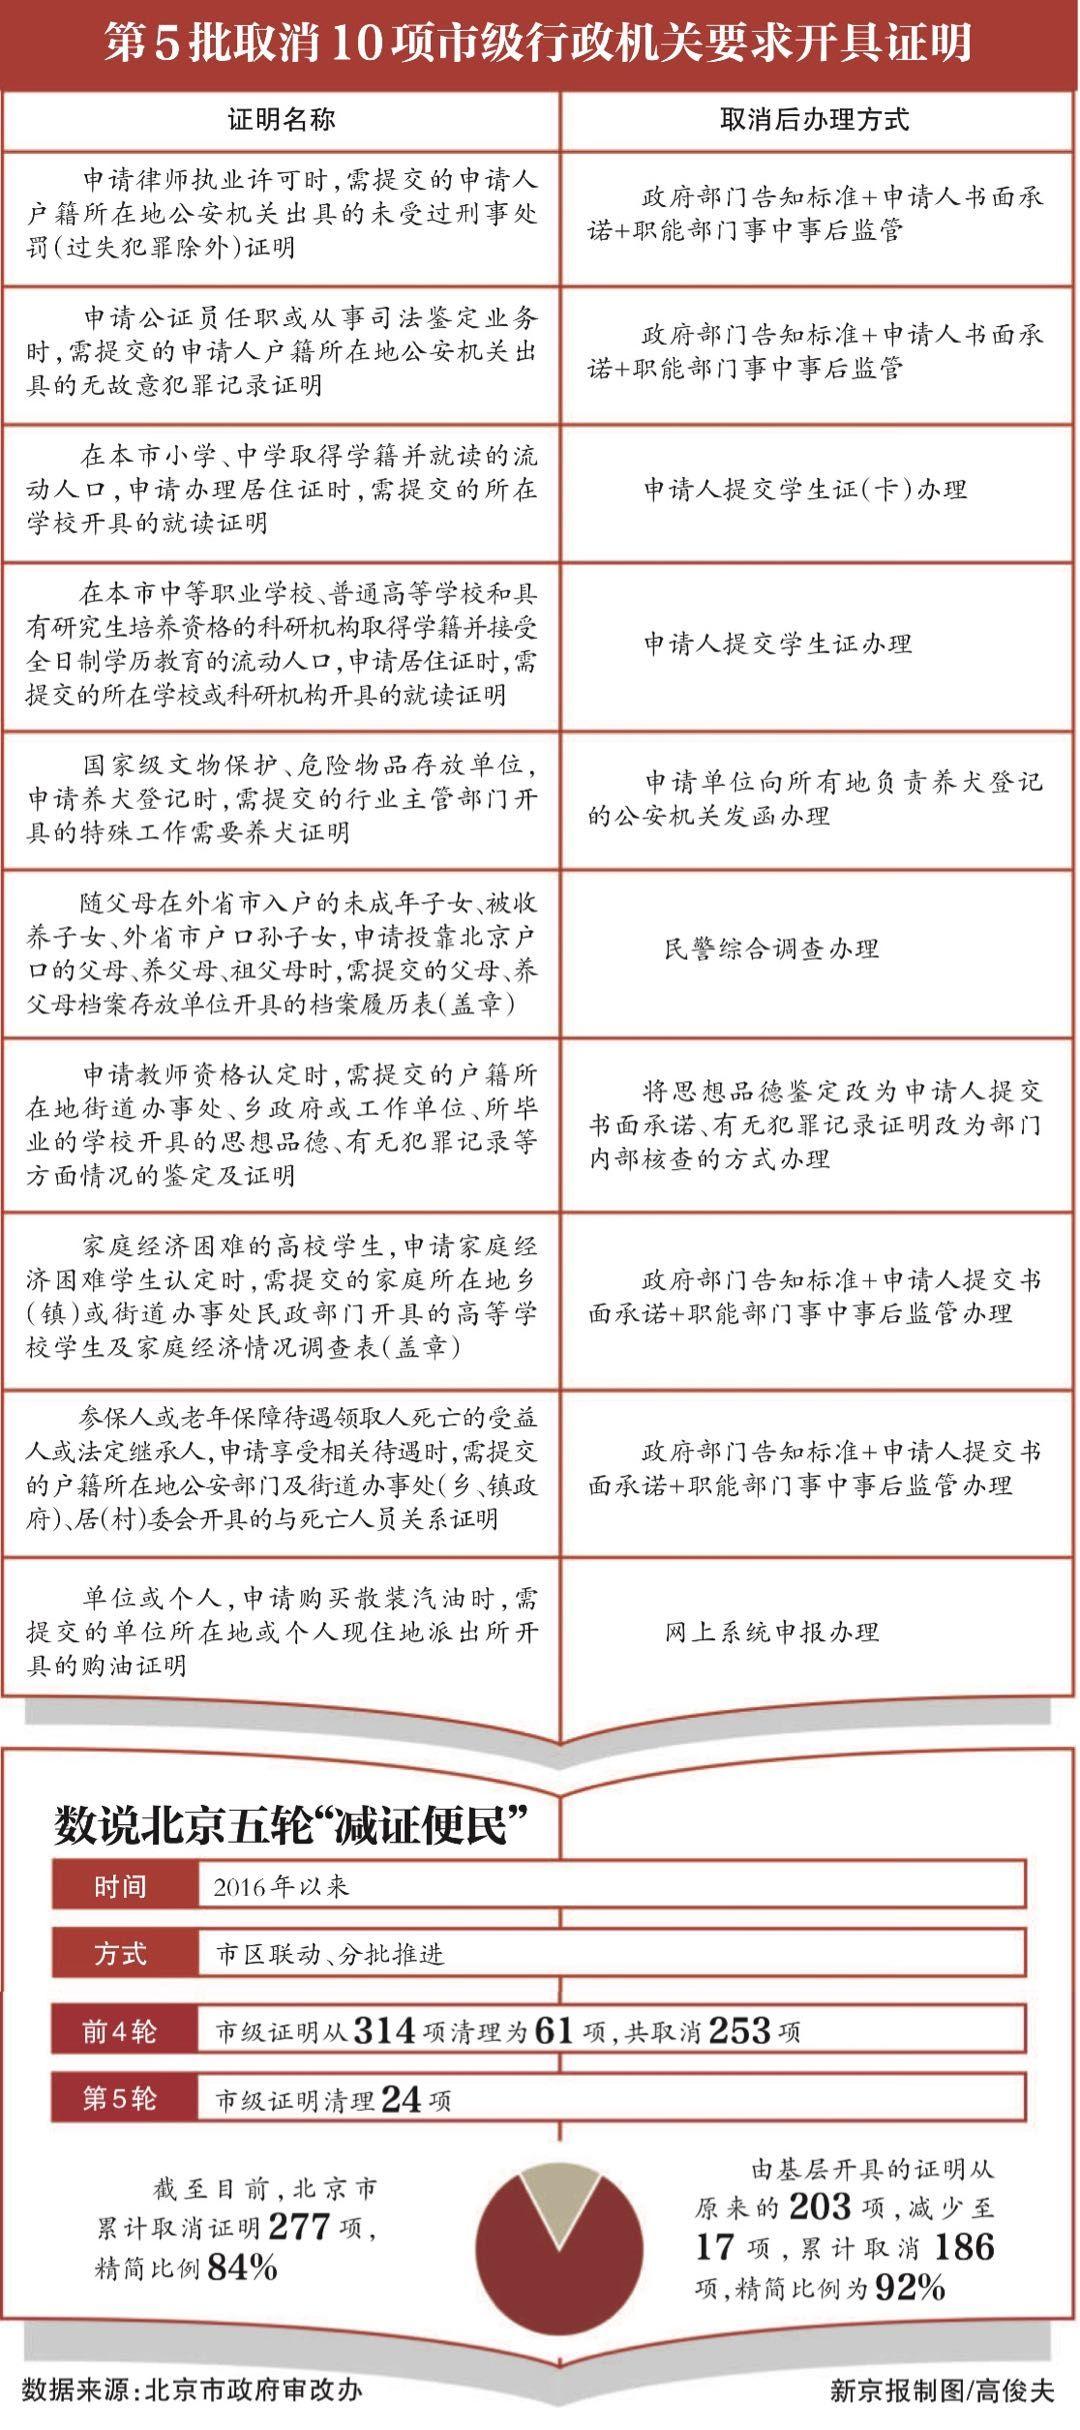 k8彩票官网娱乐官网·刘姥姥一进荣国府时,忍受了多大的耻辱?